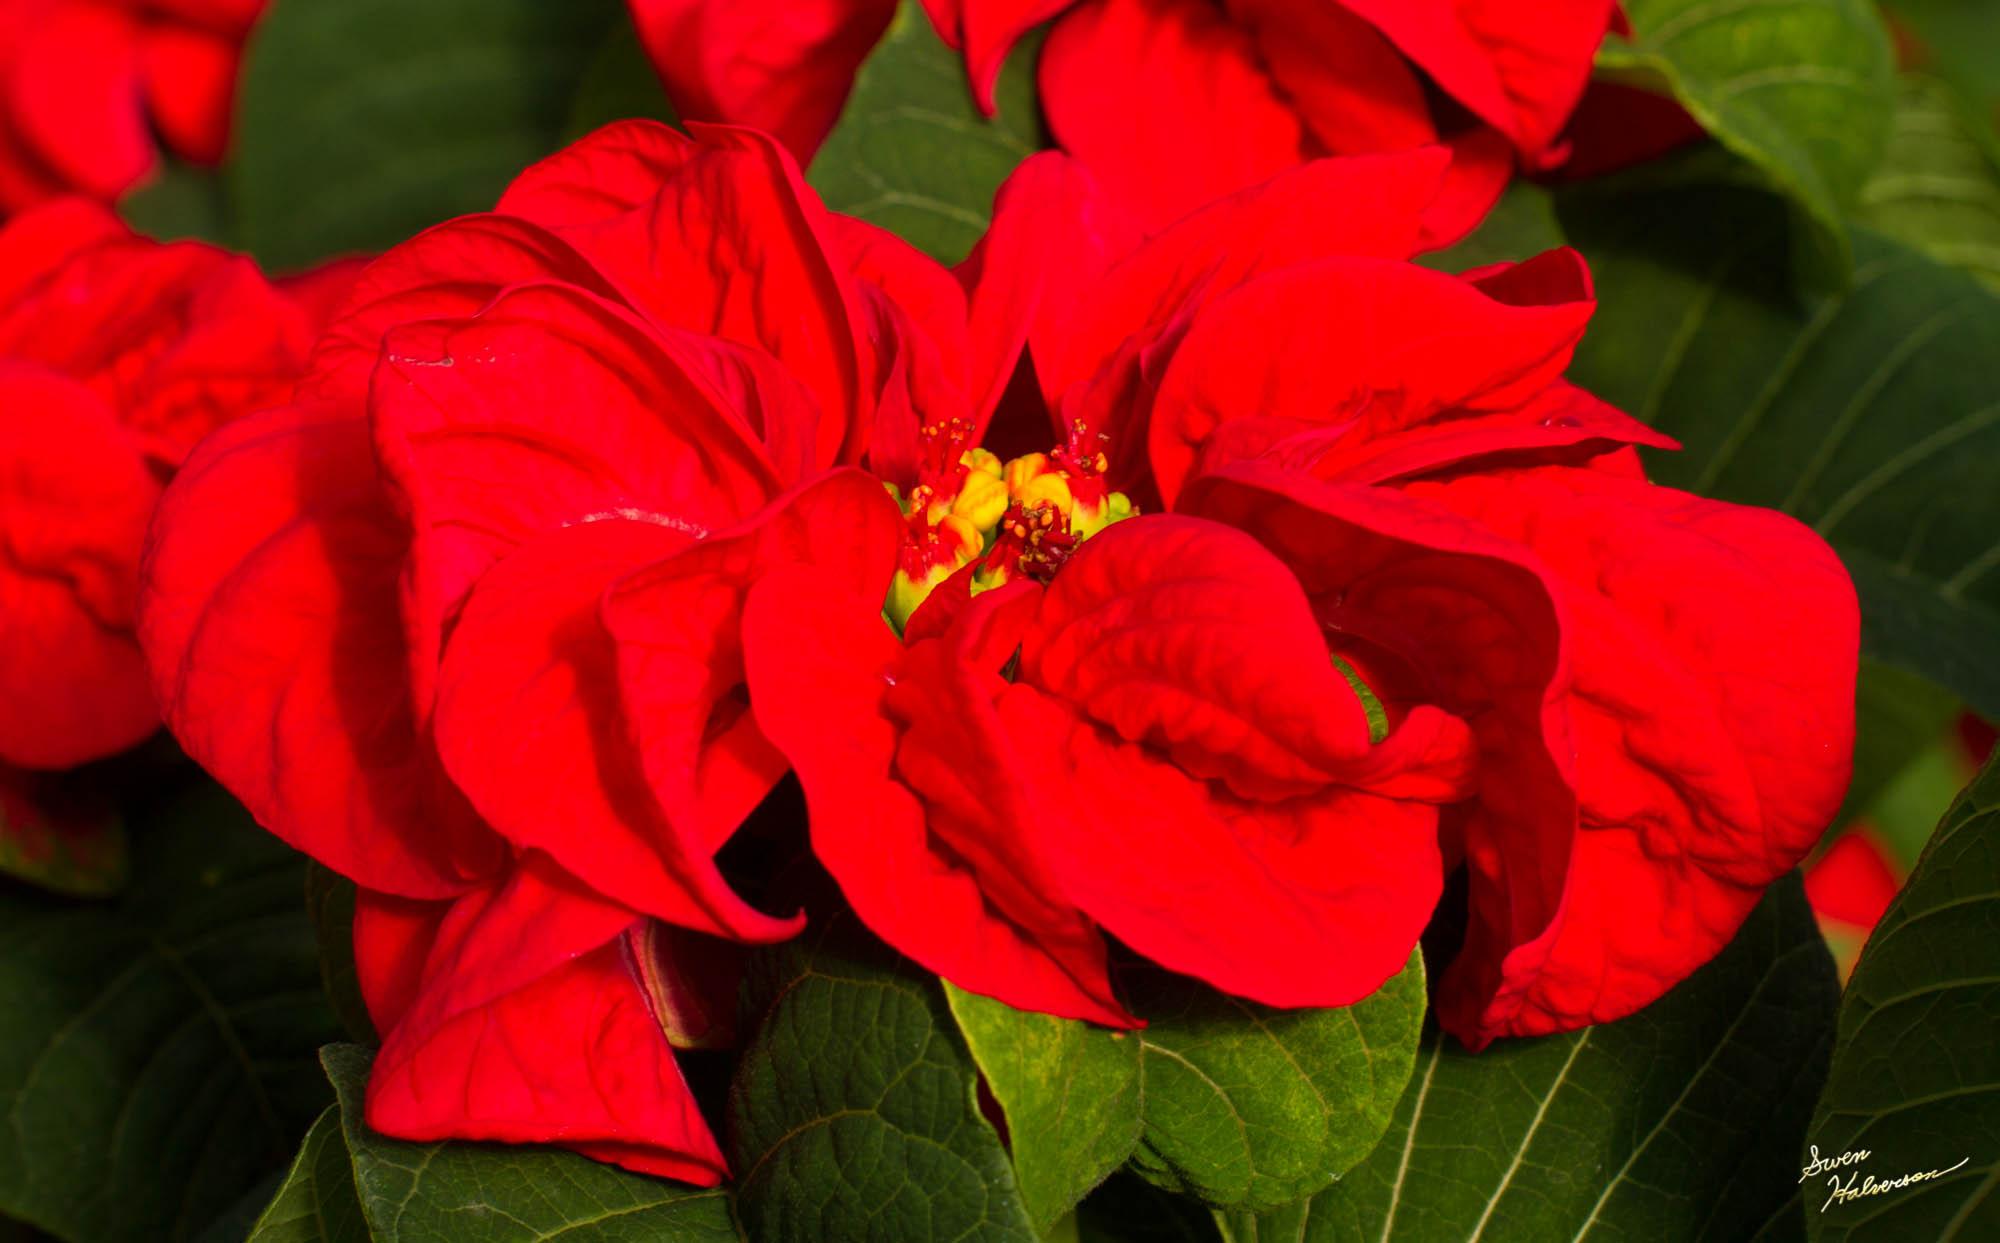 Theme:Poinsettia| Title: Winter Rose